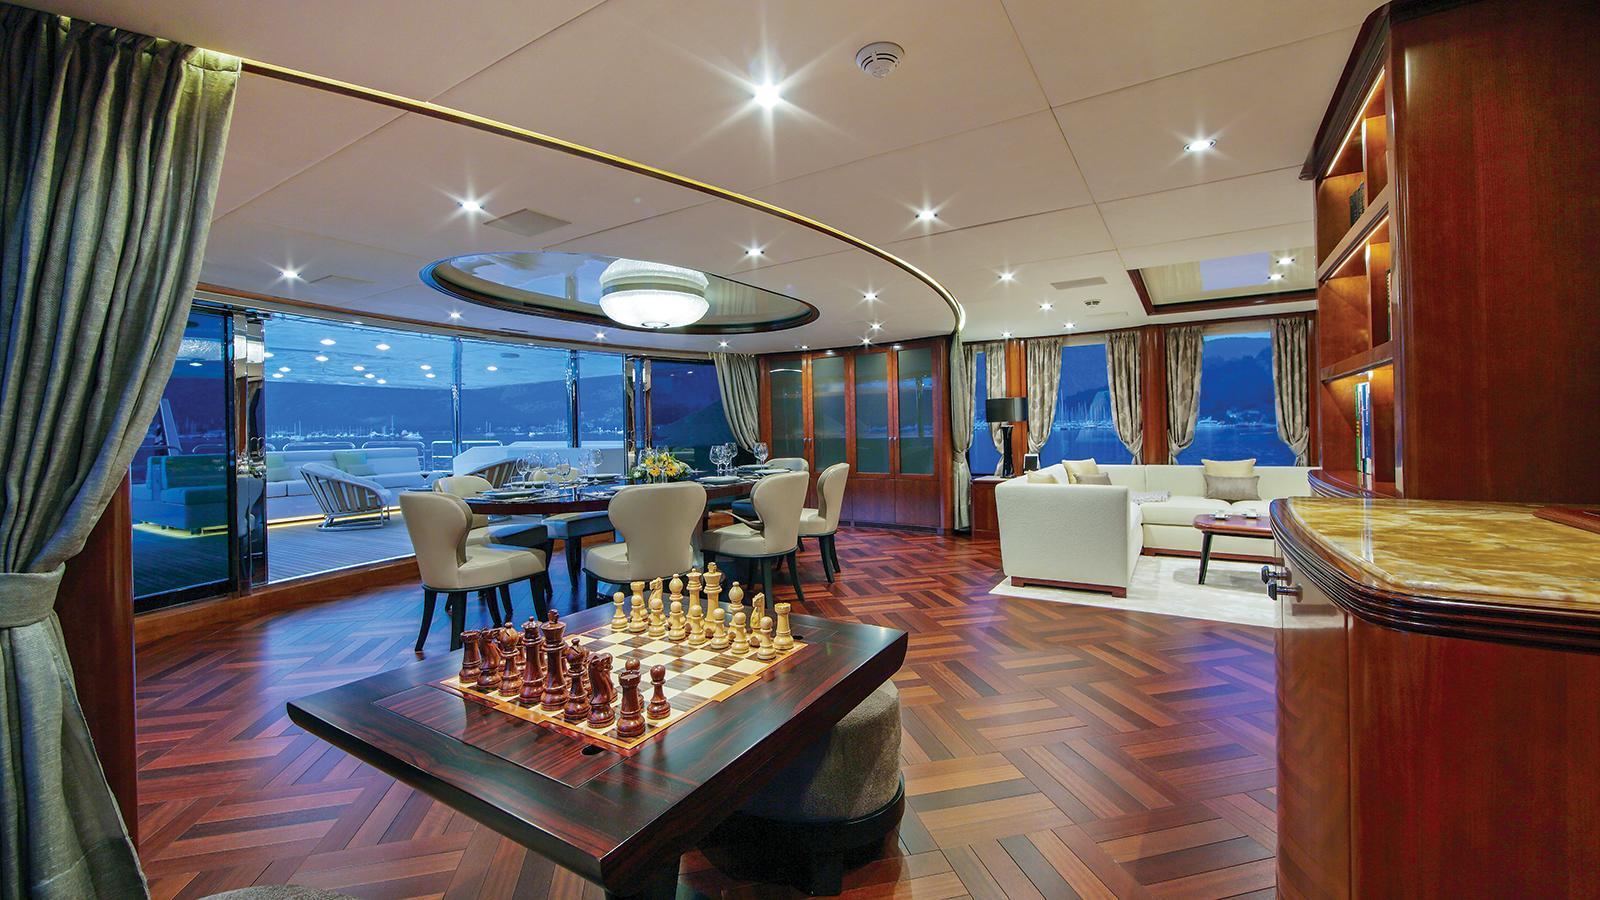 vica-motor-yacht-benetti-2015-50m-sky-lounge